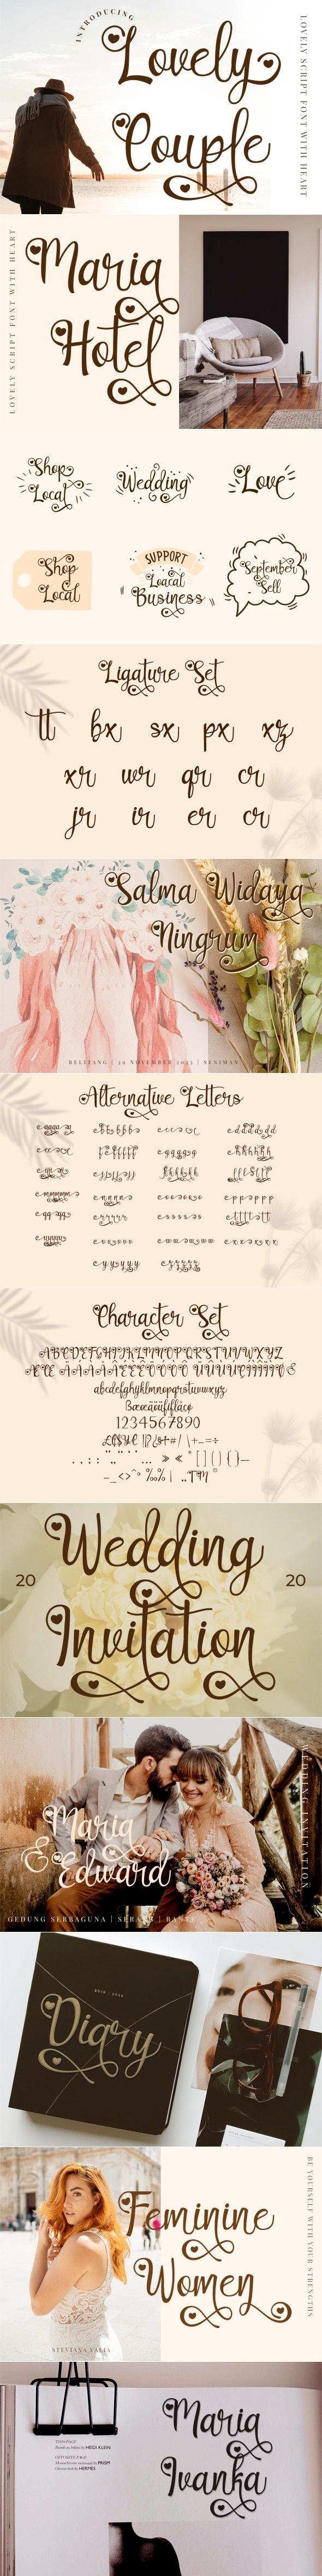 Lovely Couple - Romantic Script With Heart - Script Fonts